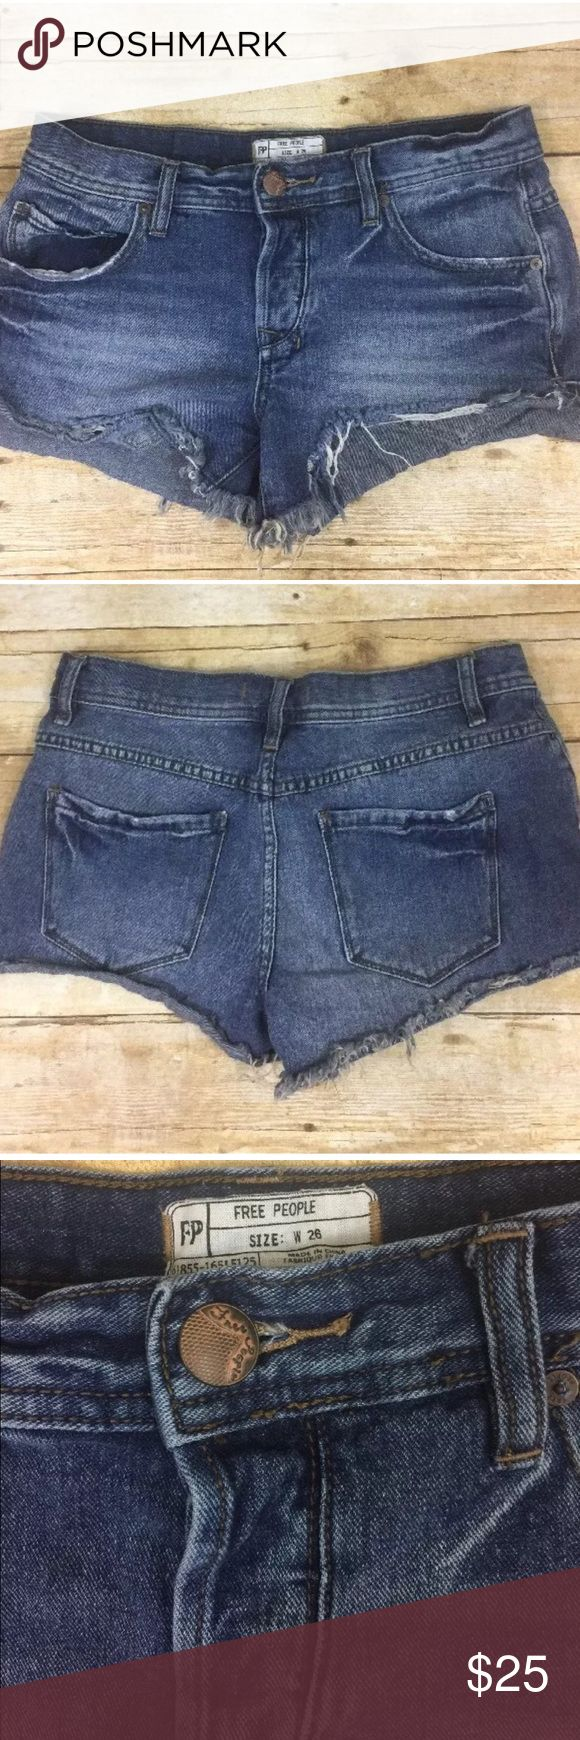 "Free People Cutoff Jean Shorts Free People Cutoff Jean Shorts Womens 26  100% Cotton  Waist-15.5"" Inseam-3"" Rise-8"" Free People Shorts Jean Shorts"